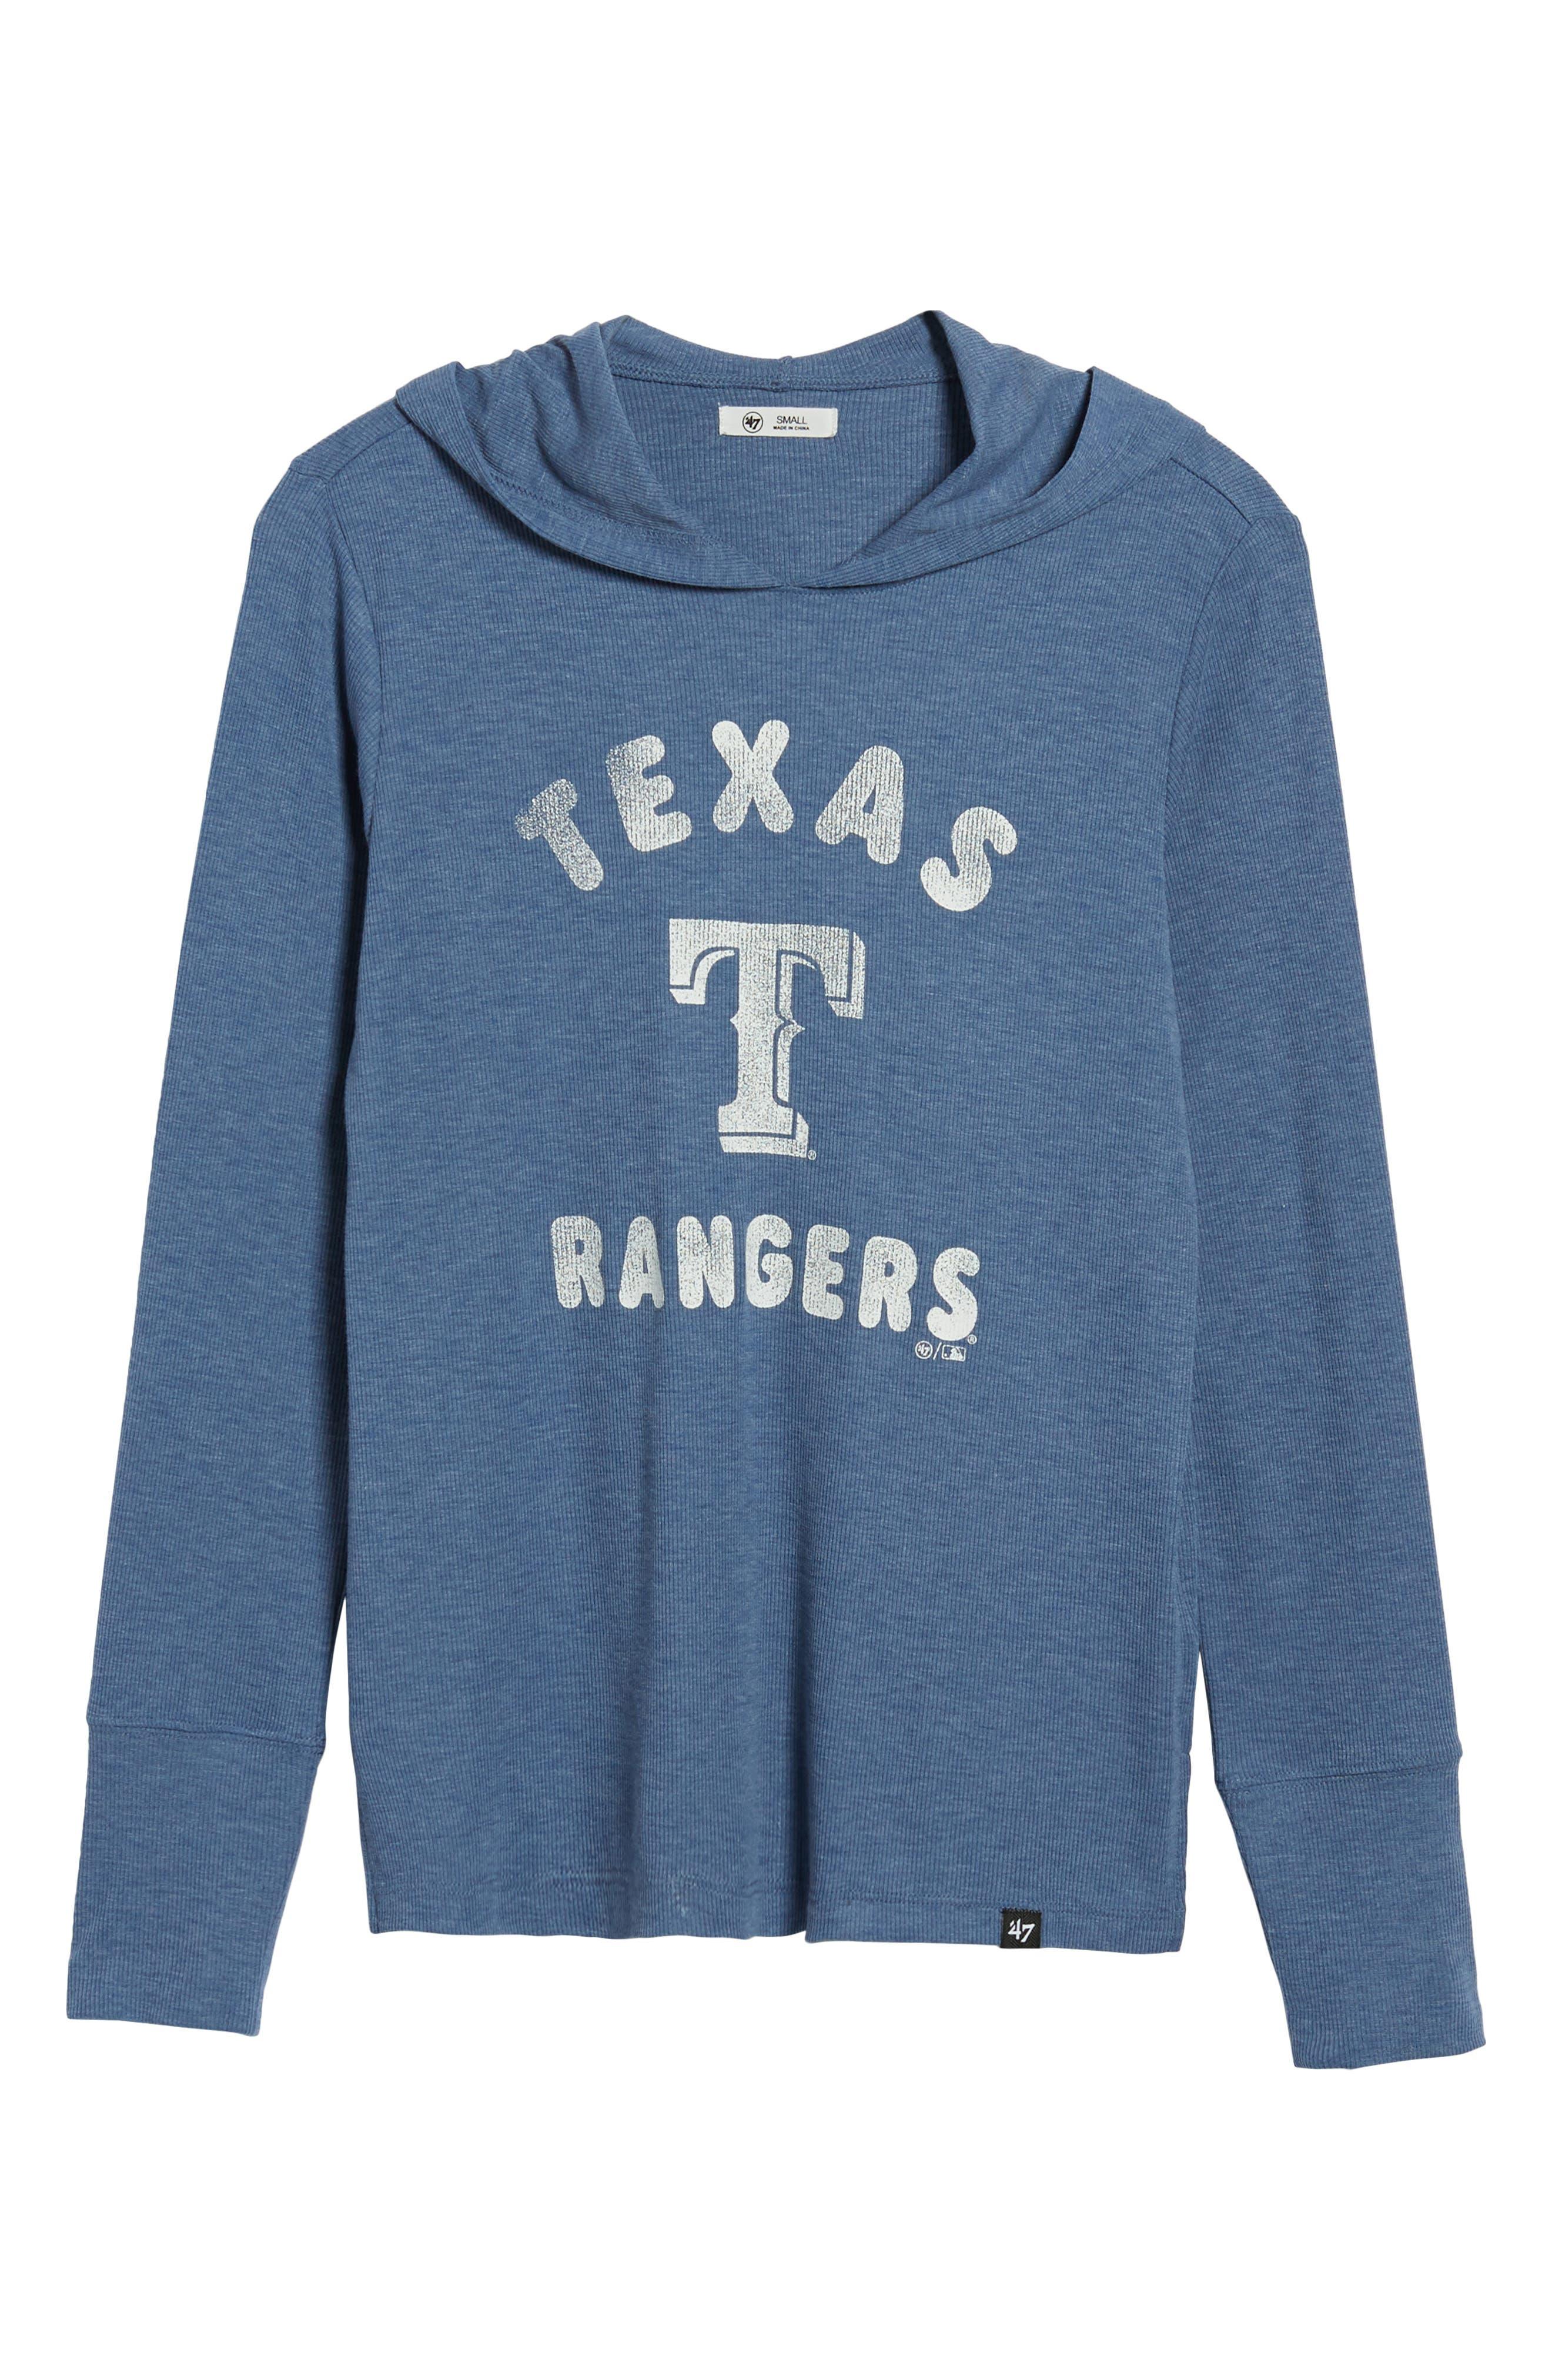 Campbell Texas Rangers Rib Knit Hooded Top,                             Alternate thumbnail 7, color,                             Bleacher Blue